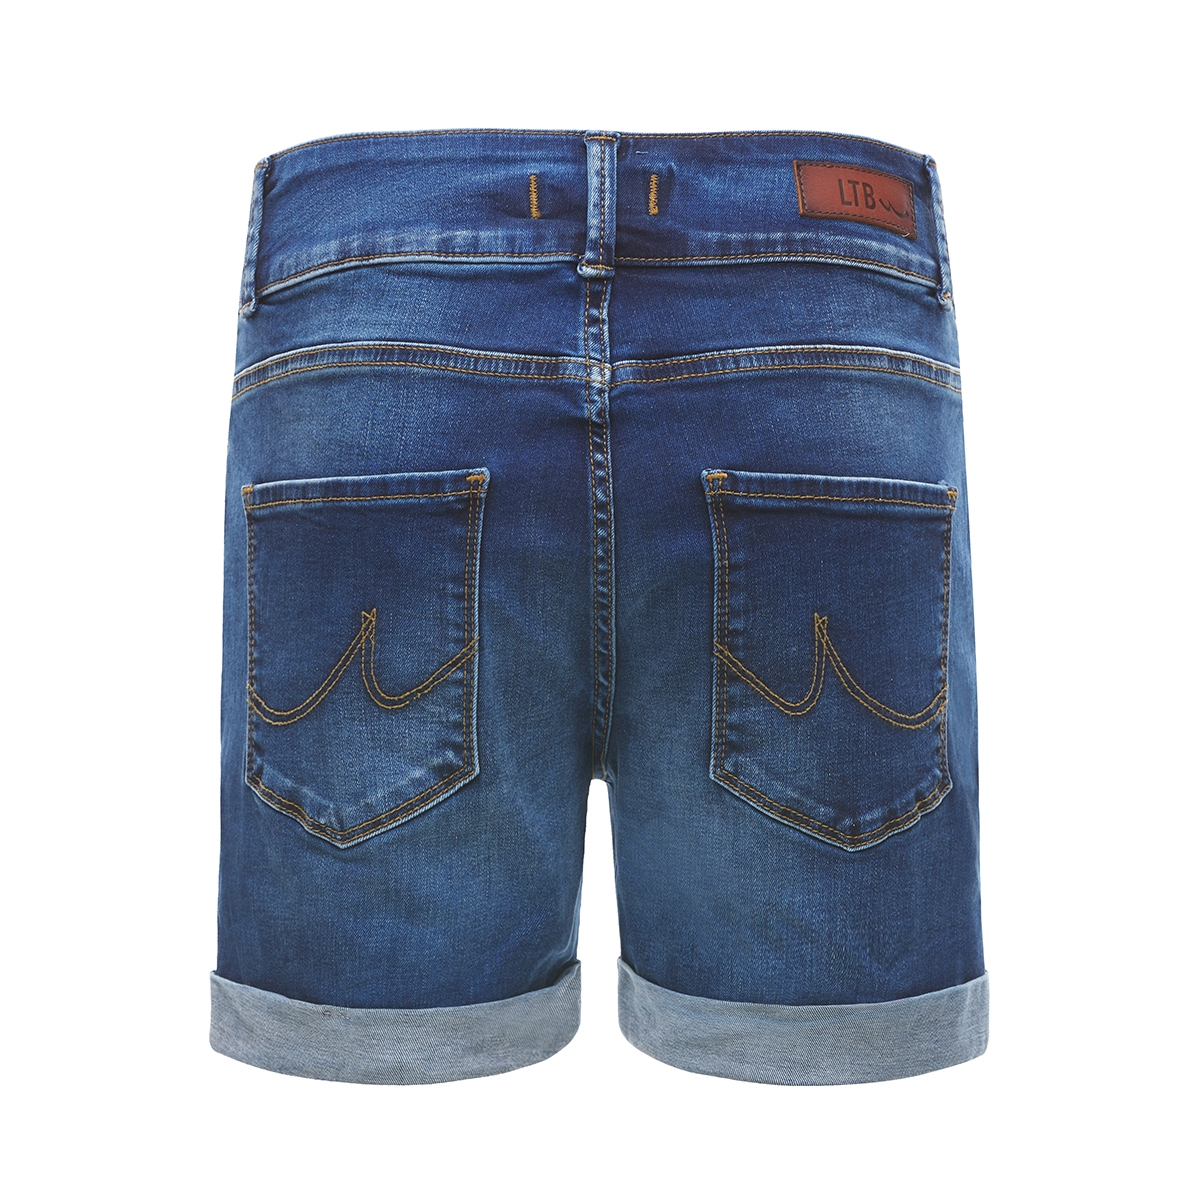 becky x 60645 14645 ltb korte broek 52202 ikeda wash